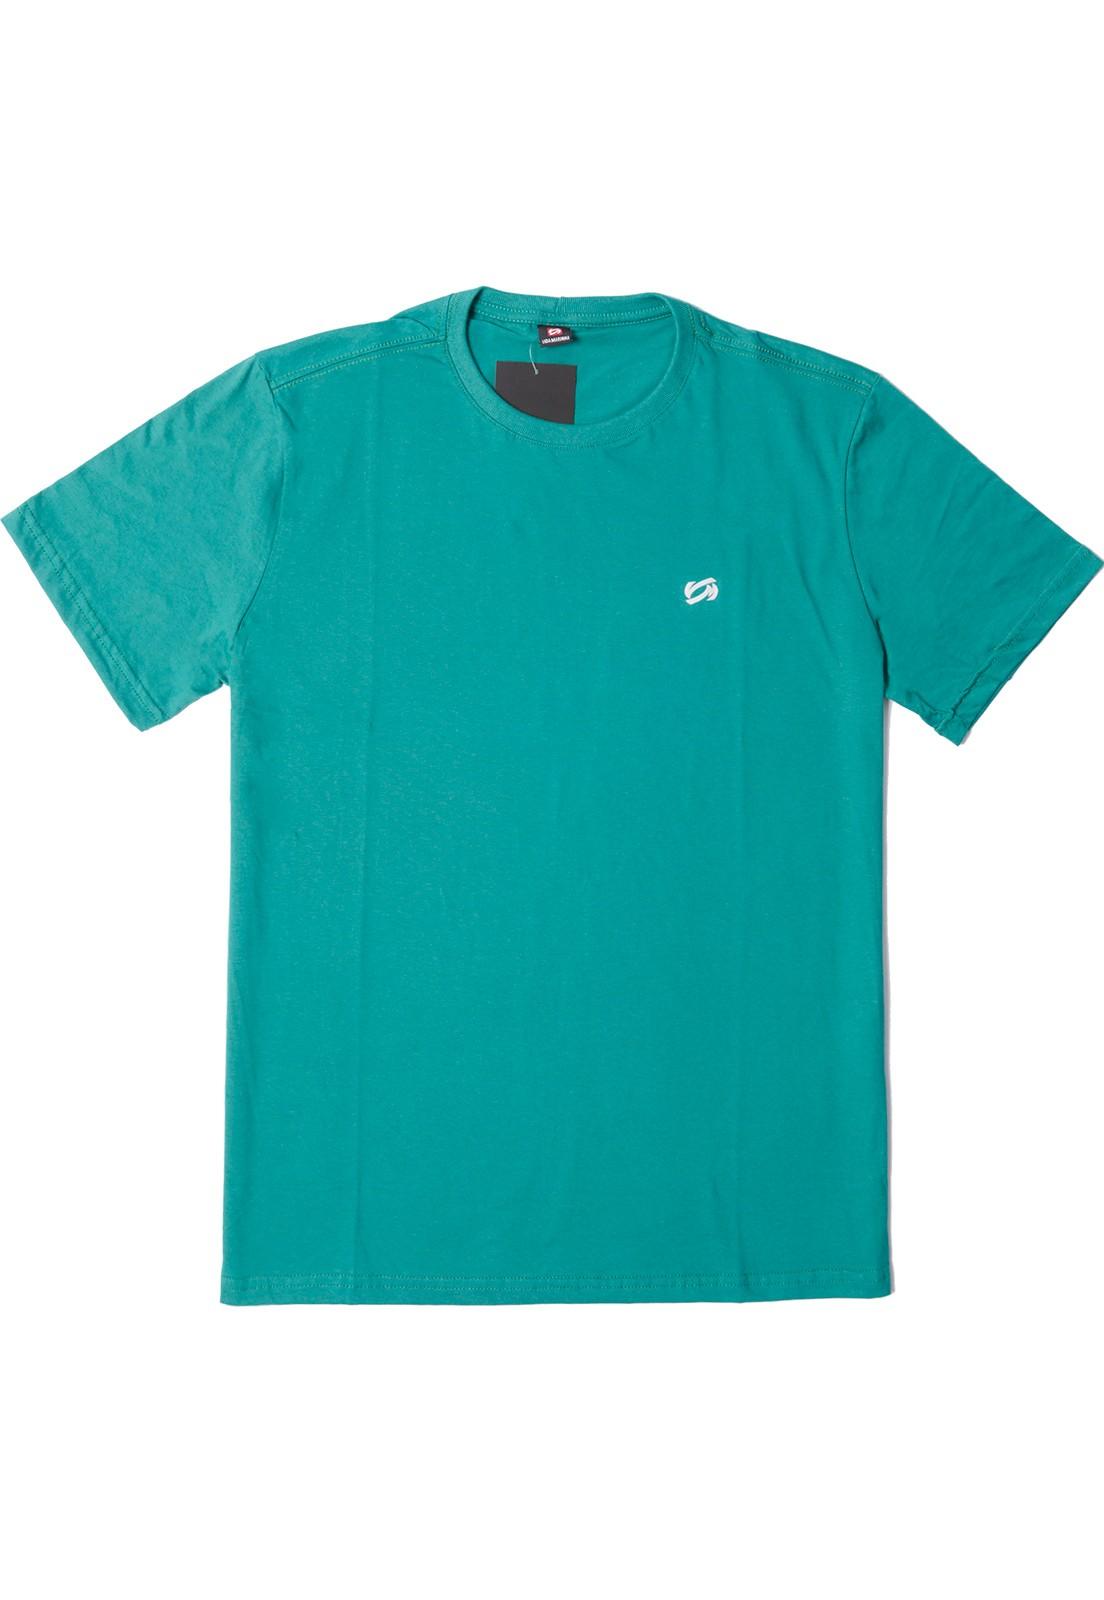 Camiseta Vida Marinha Manga Curta Básica Azul Petróleo